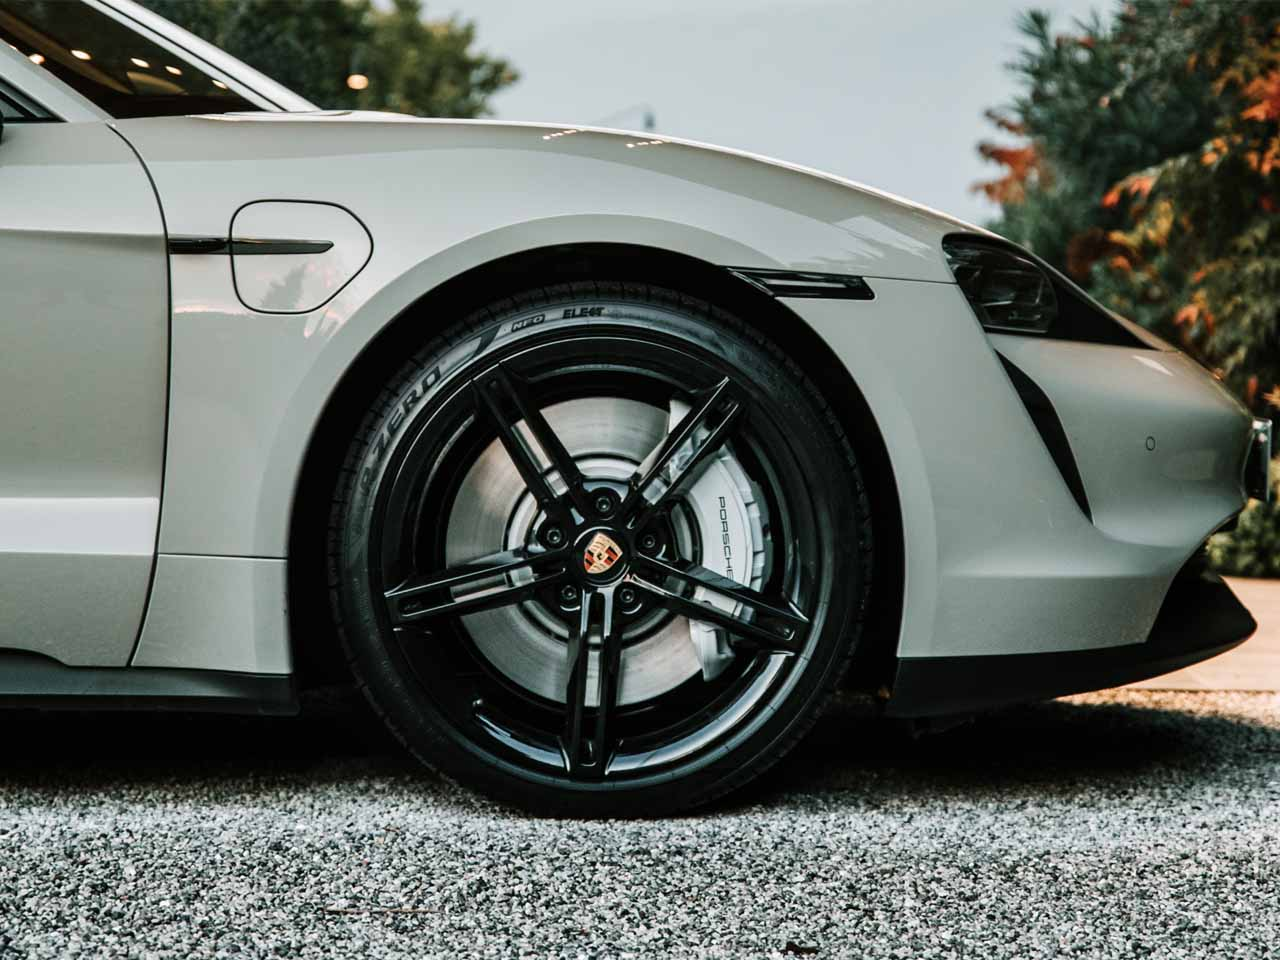 P Zero Elect - Porsche Taycan